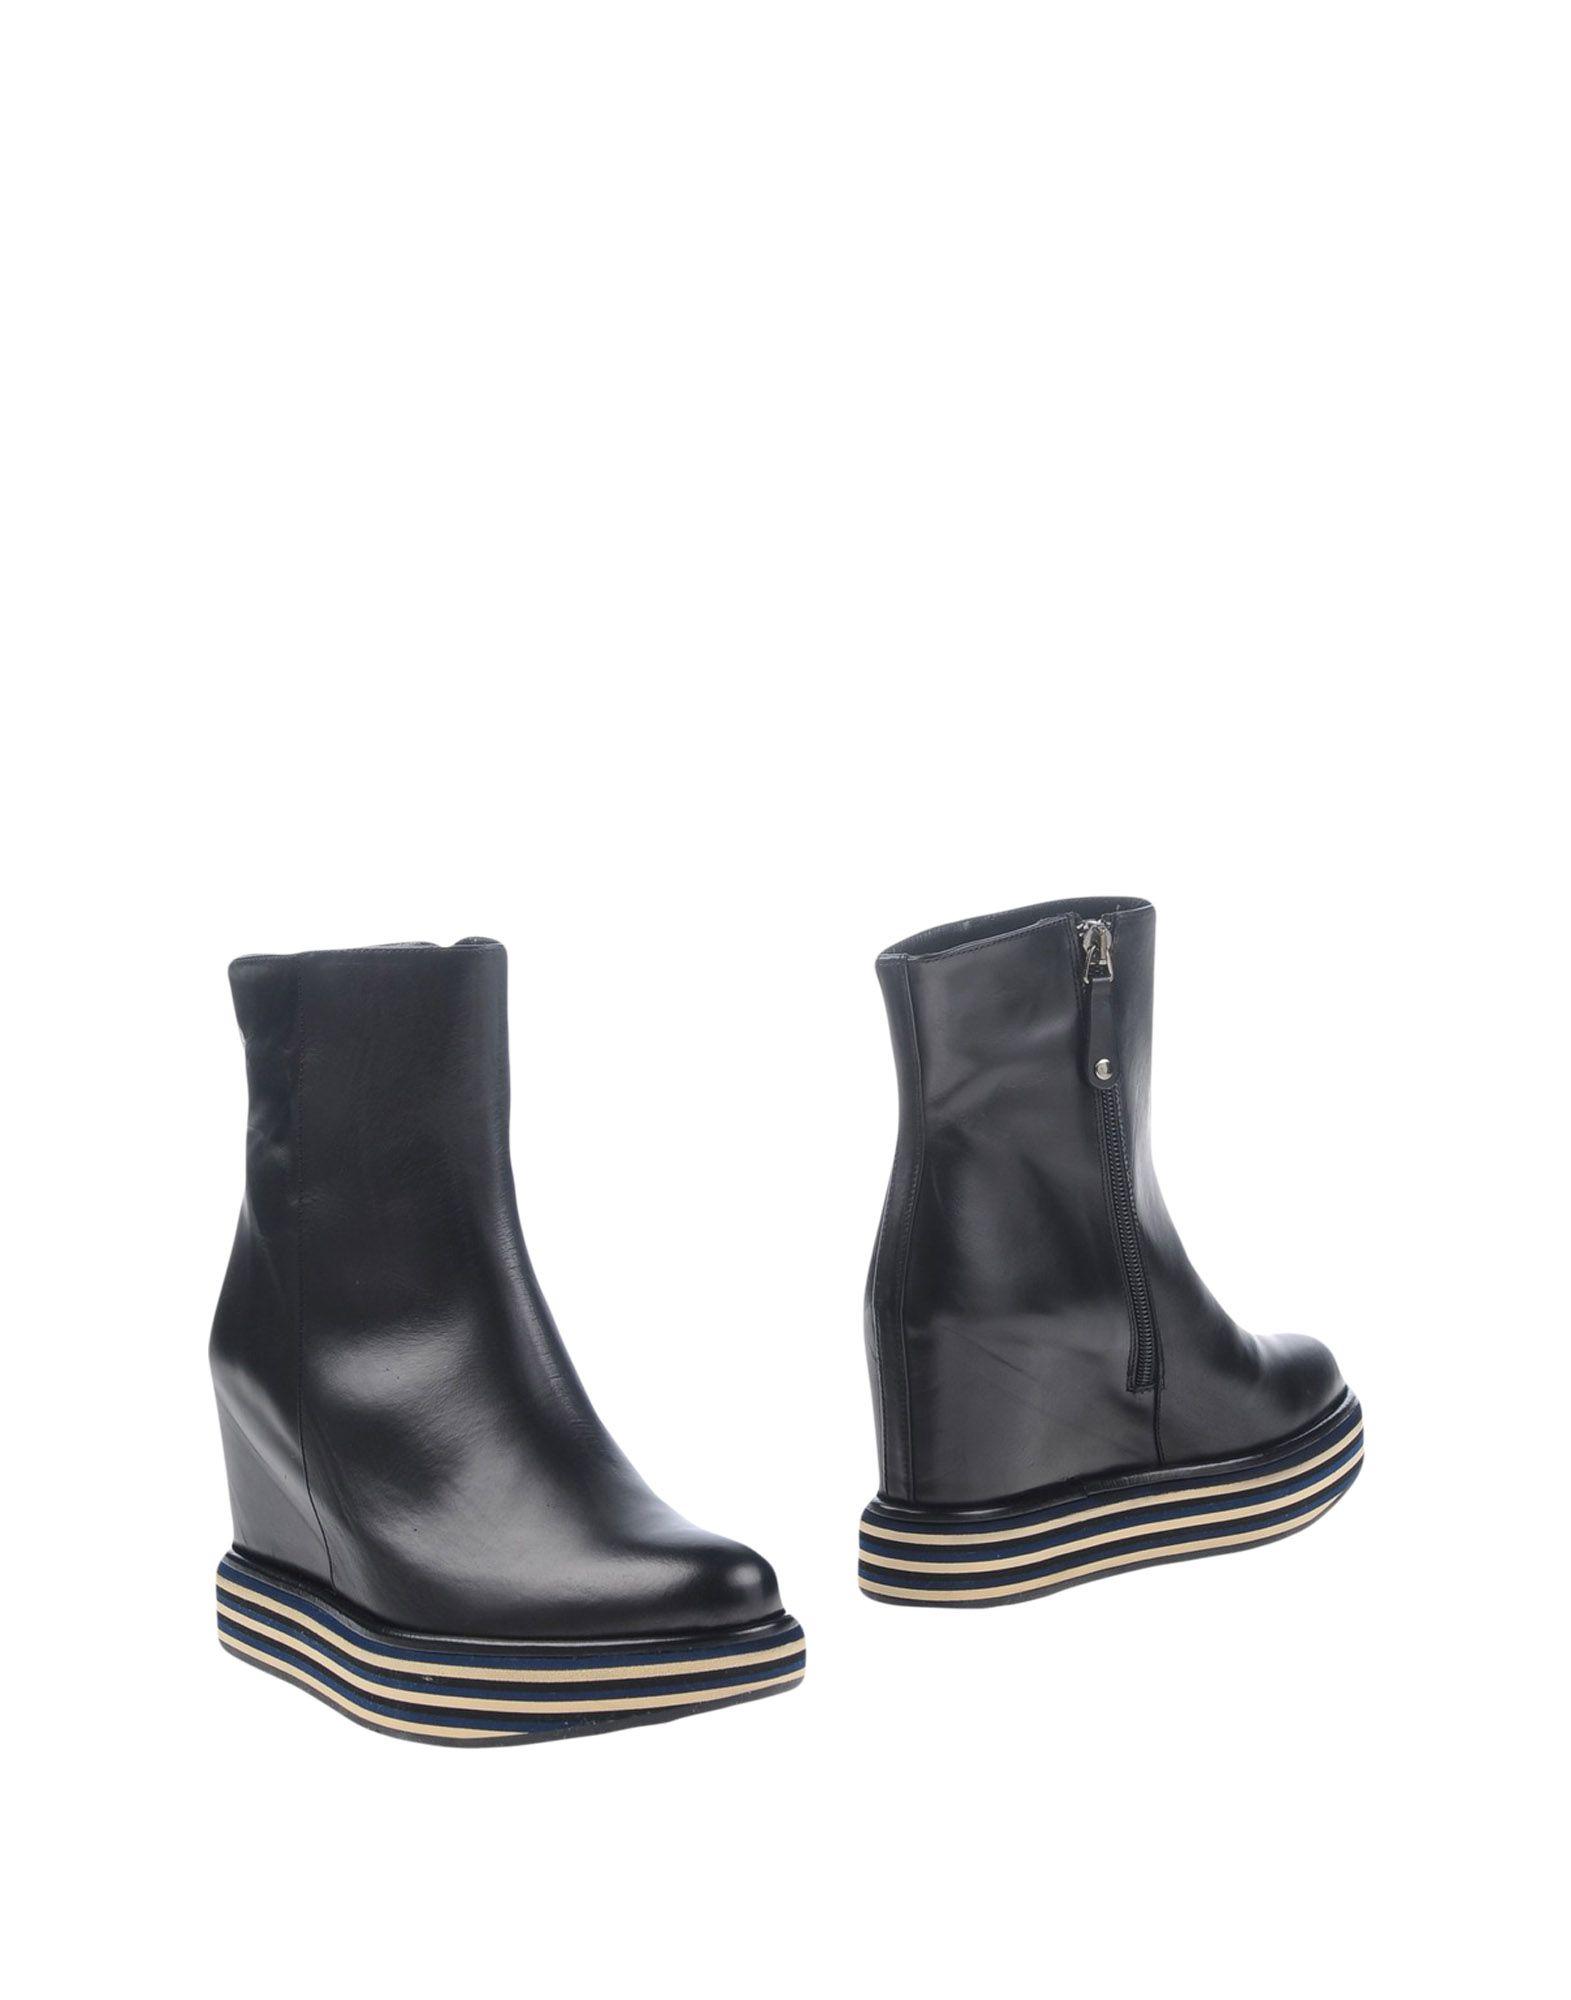 Stilvolle Stiefelette billige Schuhe Paloma Barceló Stiefelette Stilvolle Damen  11224233QJ 34b787